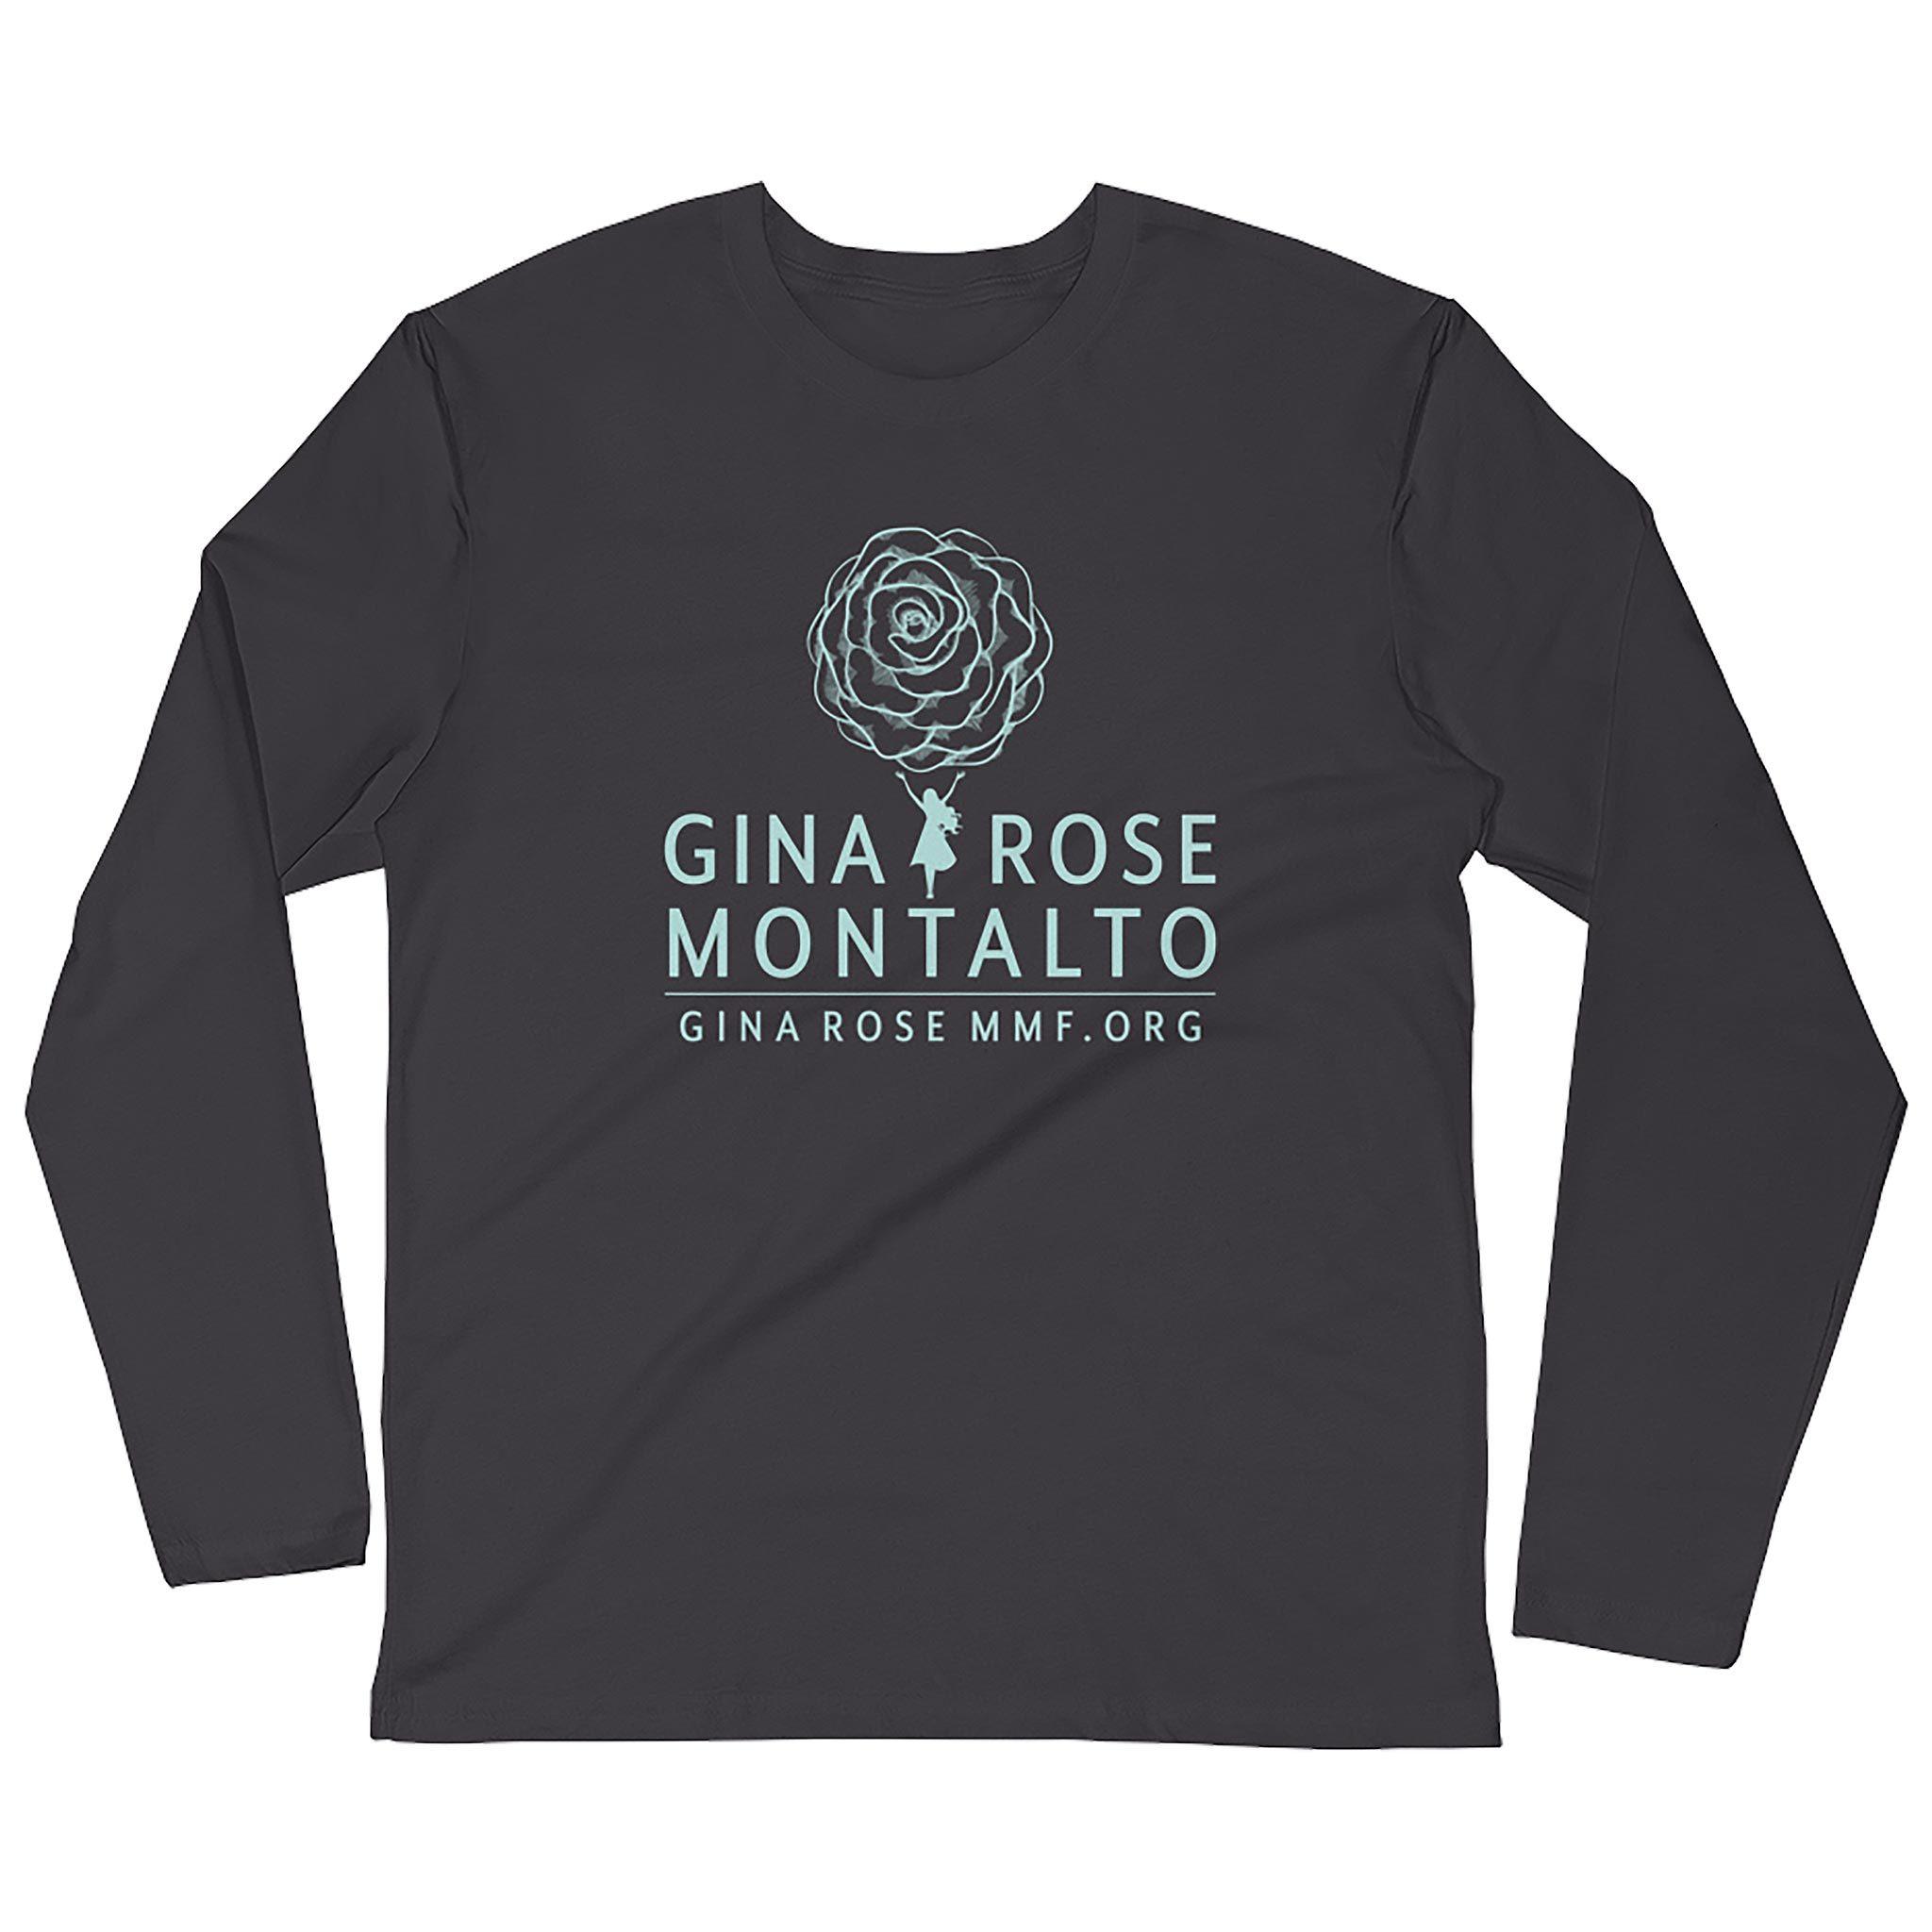 gina_rose_montalto-long_sleeve-shirt_2048x2048.jpg